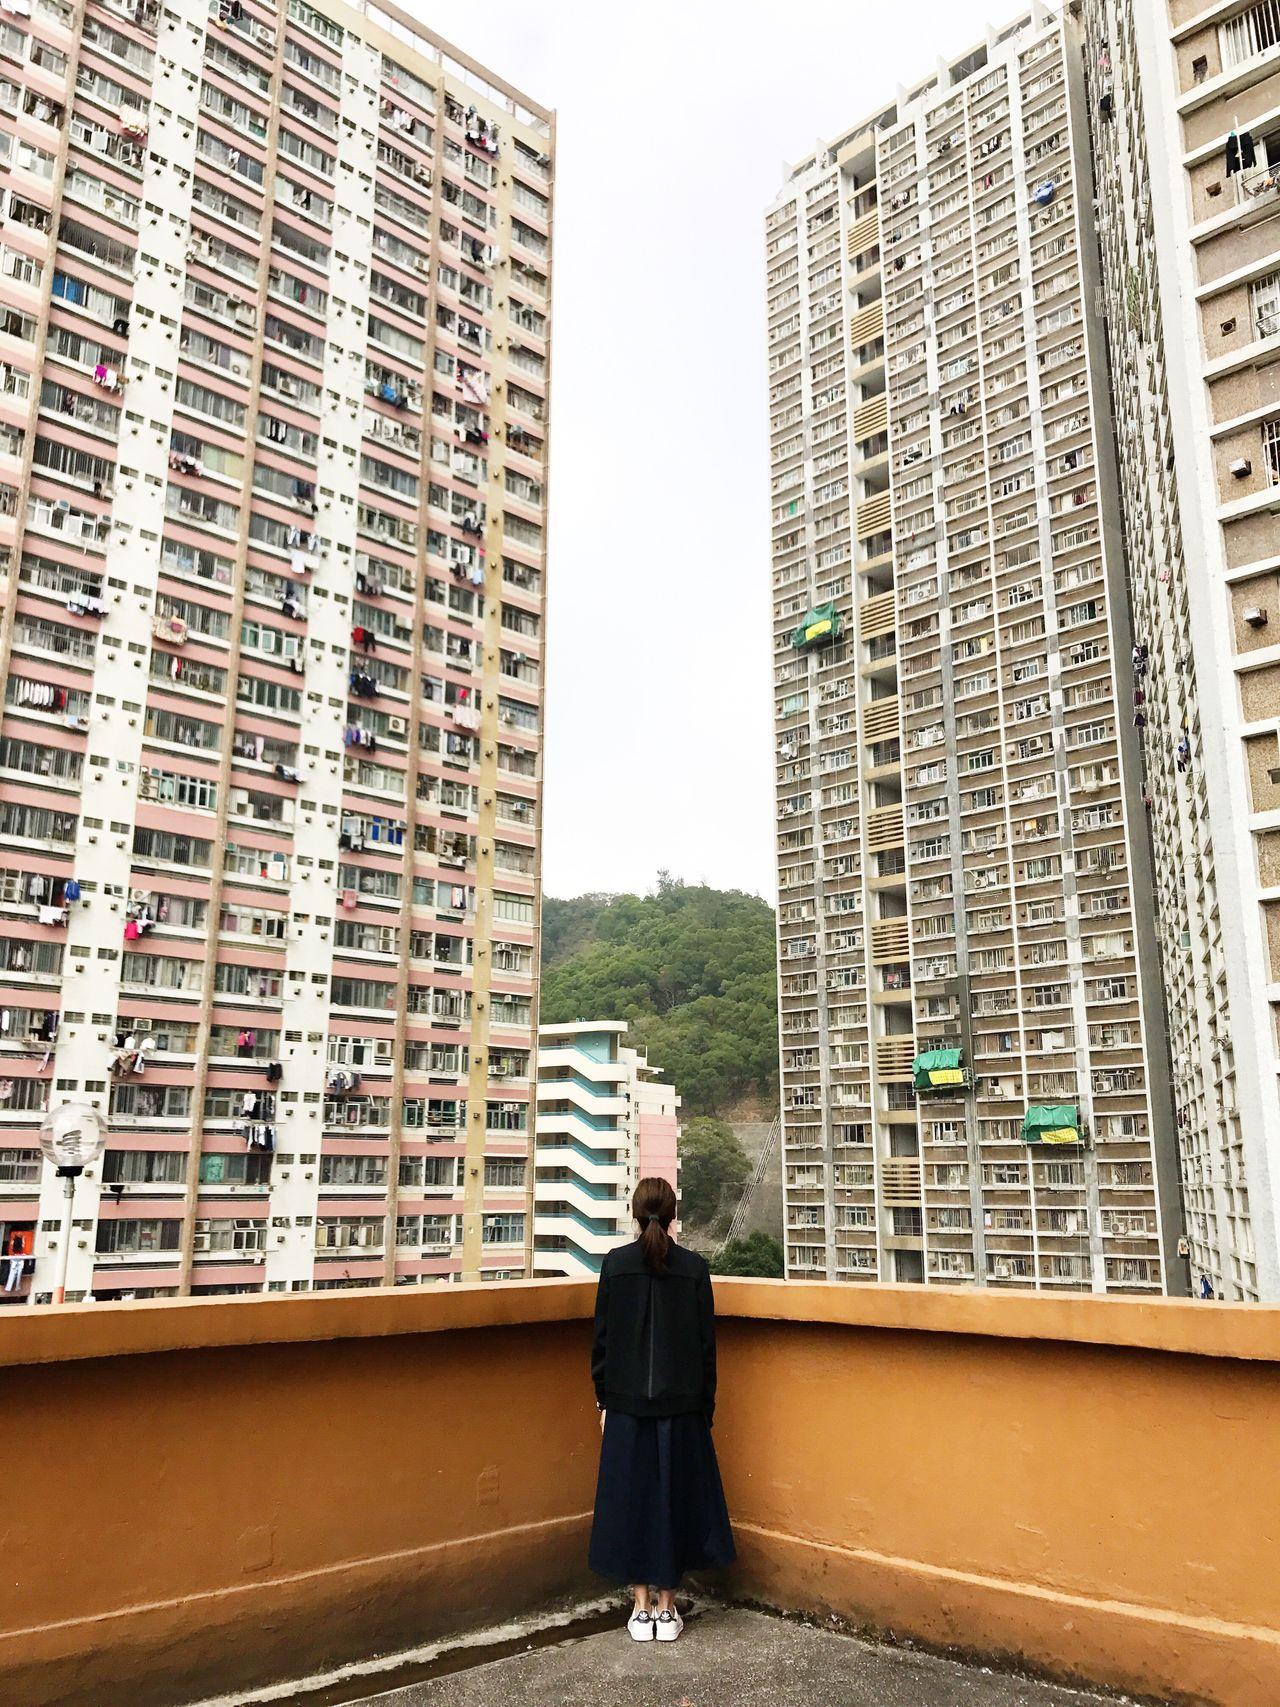 IPhone7Plus IPhone Iphonesia IPhone Photography Iphonephotography Iphoneonly IPhoneography ShotOnIphone Shotoniphone7 Shotoniphone7plus Architecture One Person City Hong Kong HongKong